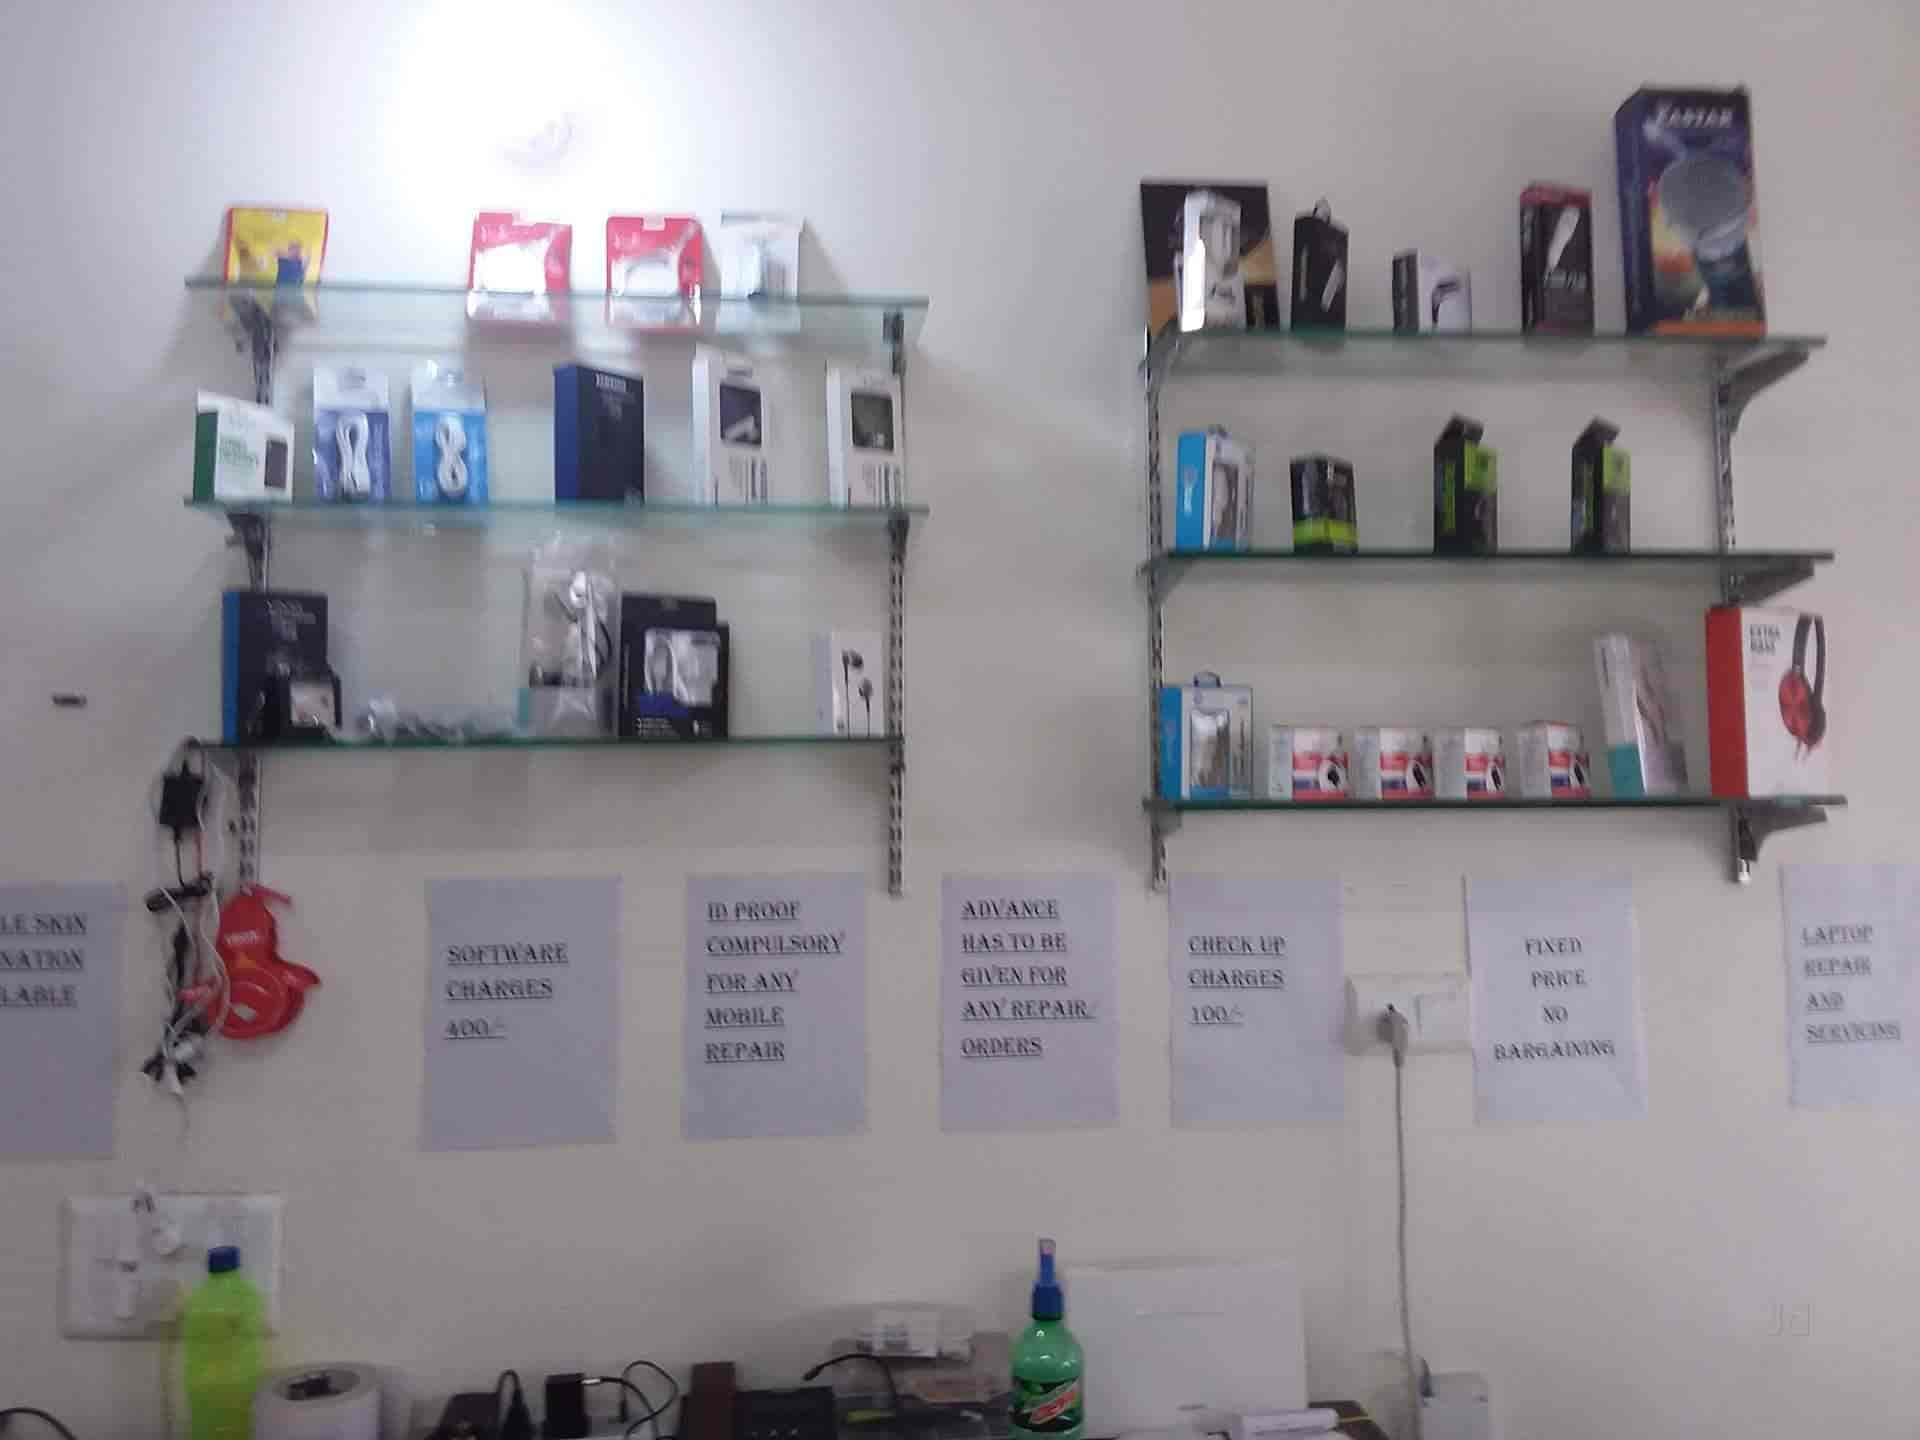 Rana Ji, Zirakpur Ho - Mobile Phone Dealers in Zirakpur